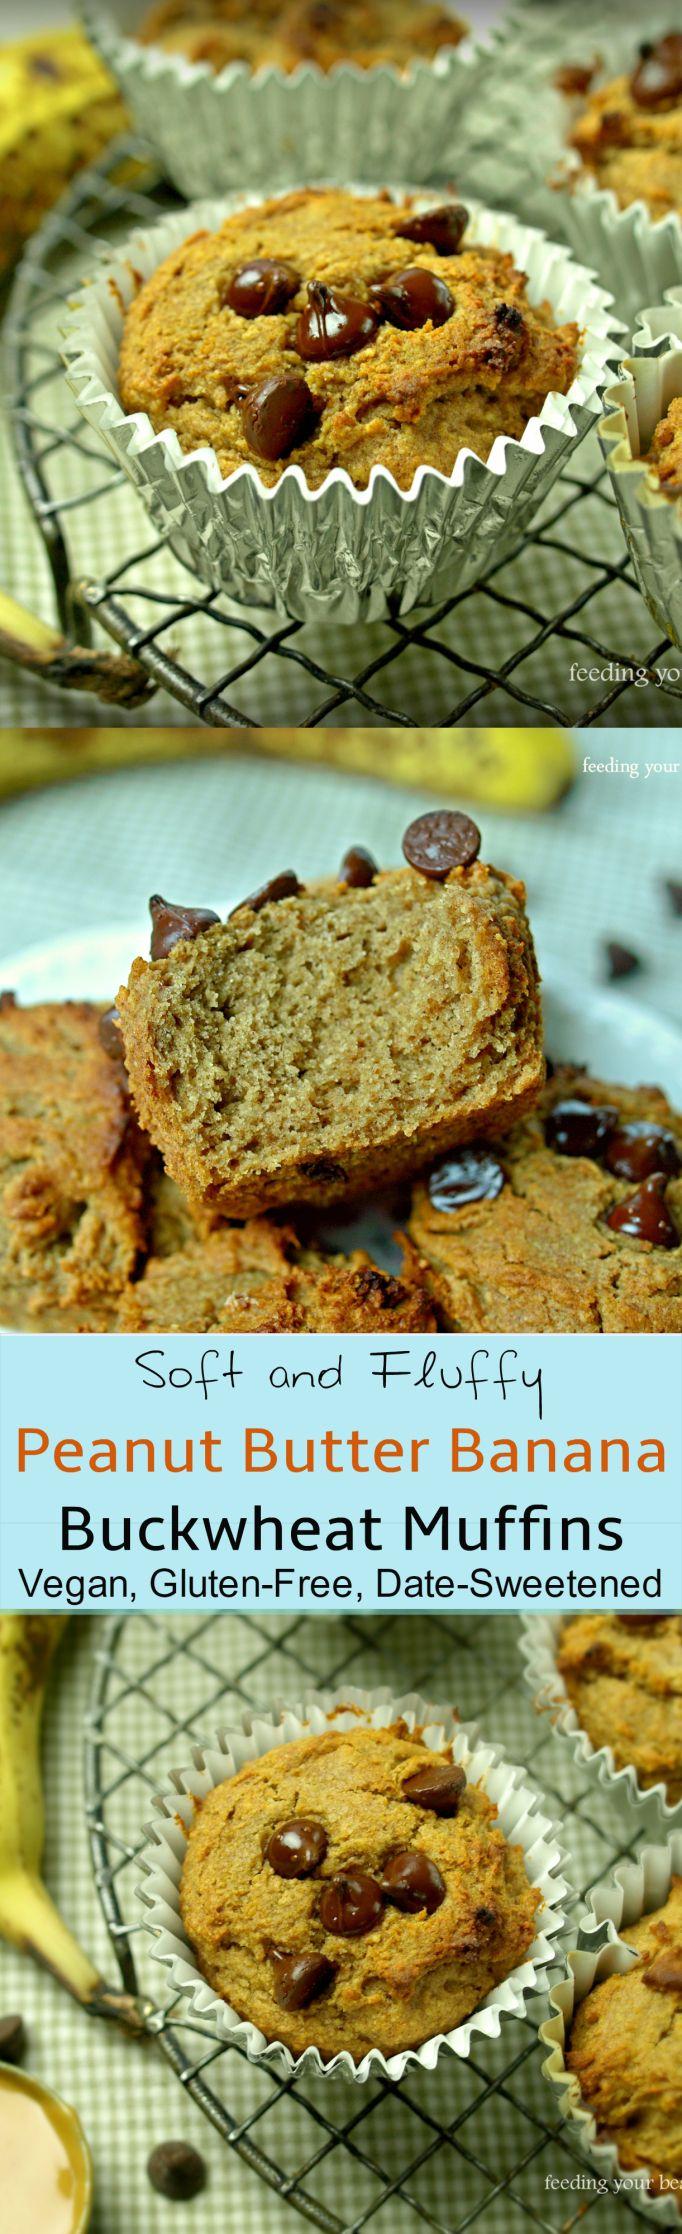 Peanut Butter and Banana Buckwheat Muffins - gluten free and vegan